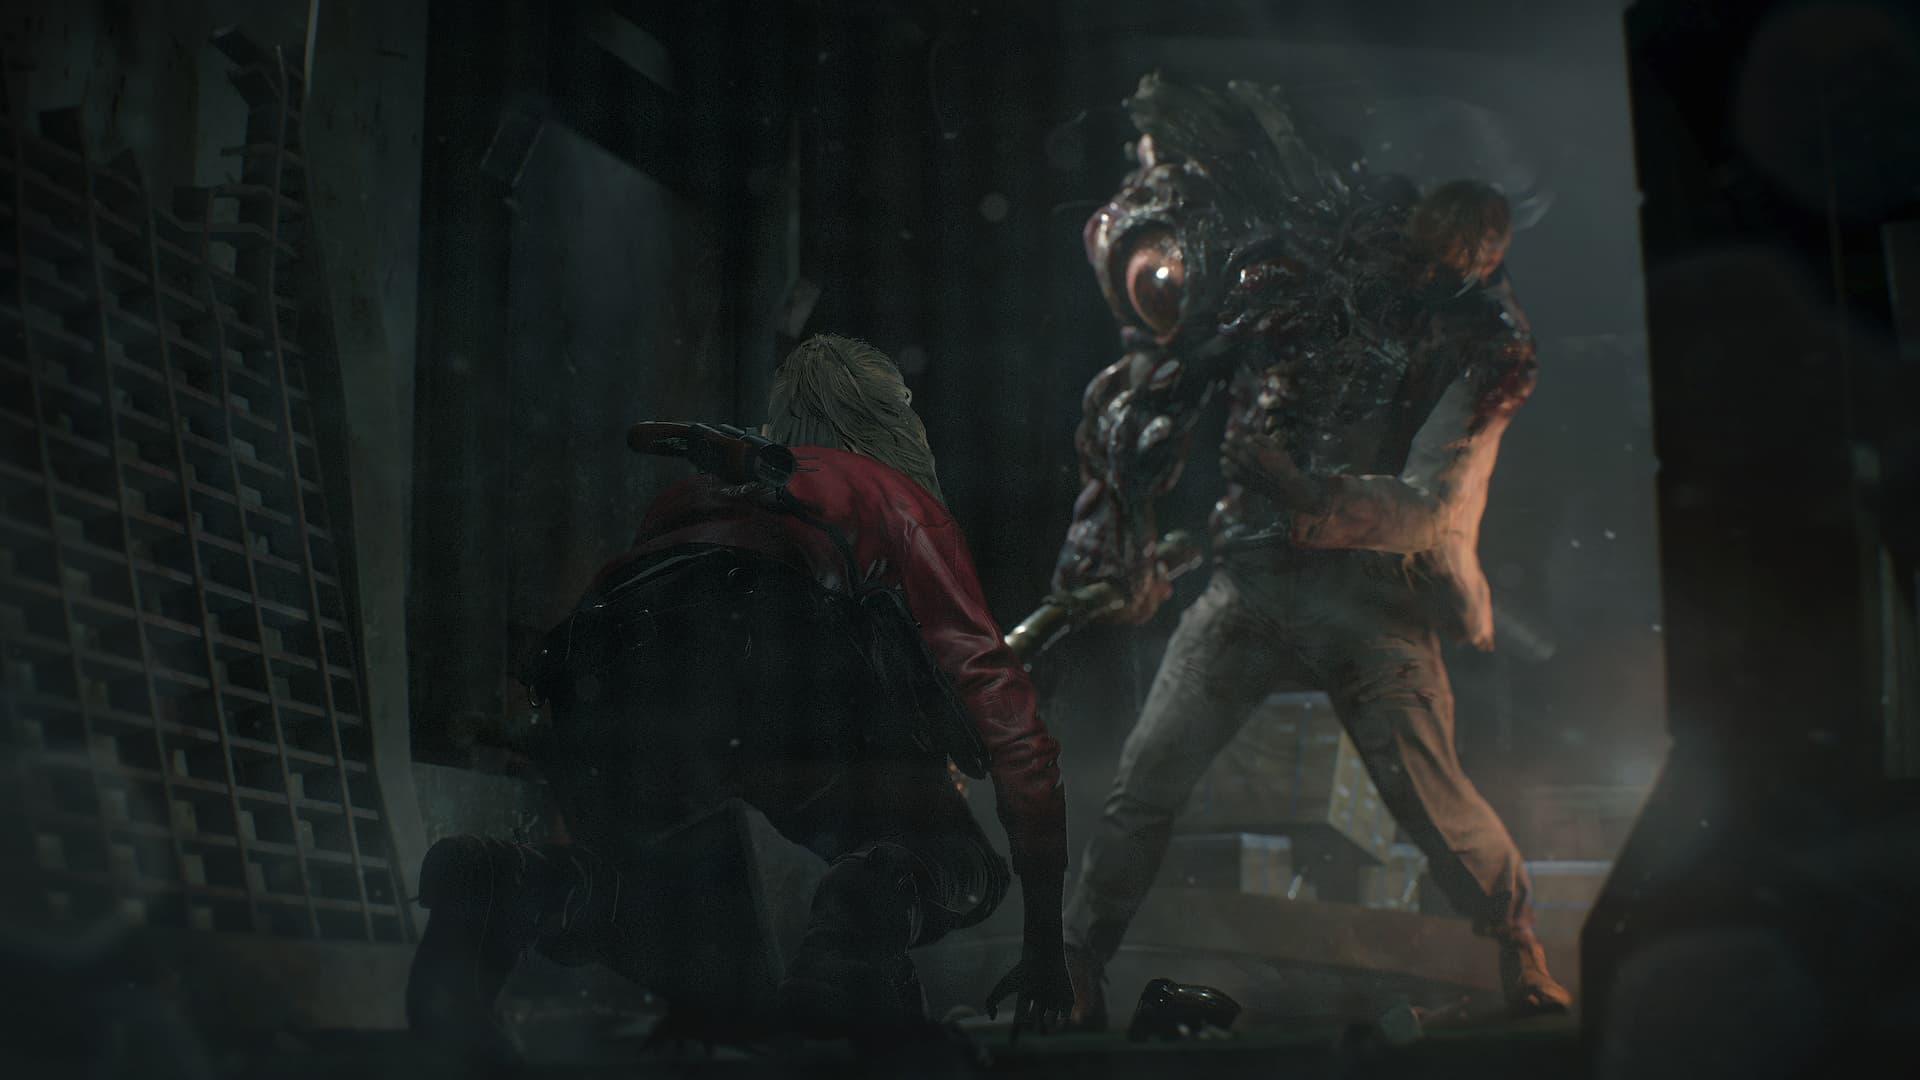 William Birkin em Resident Evil 2 Remake